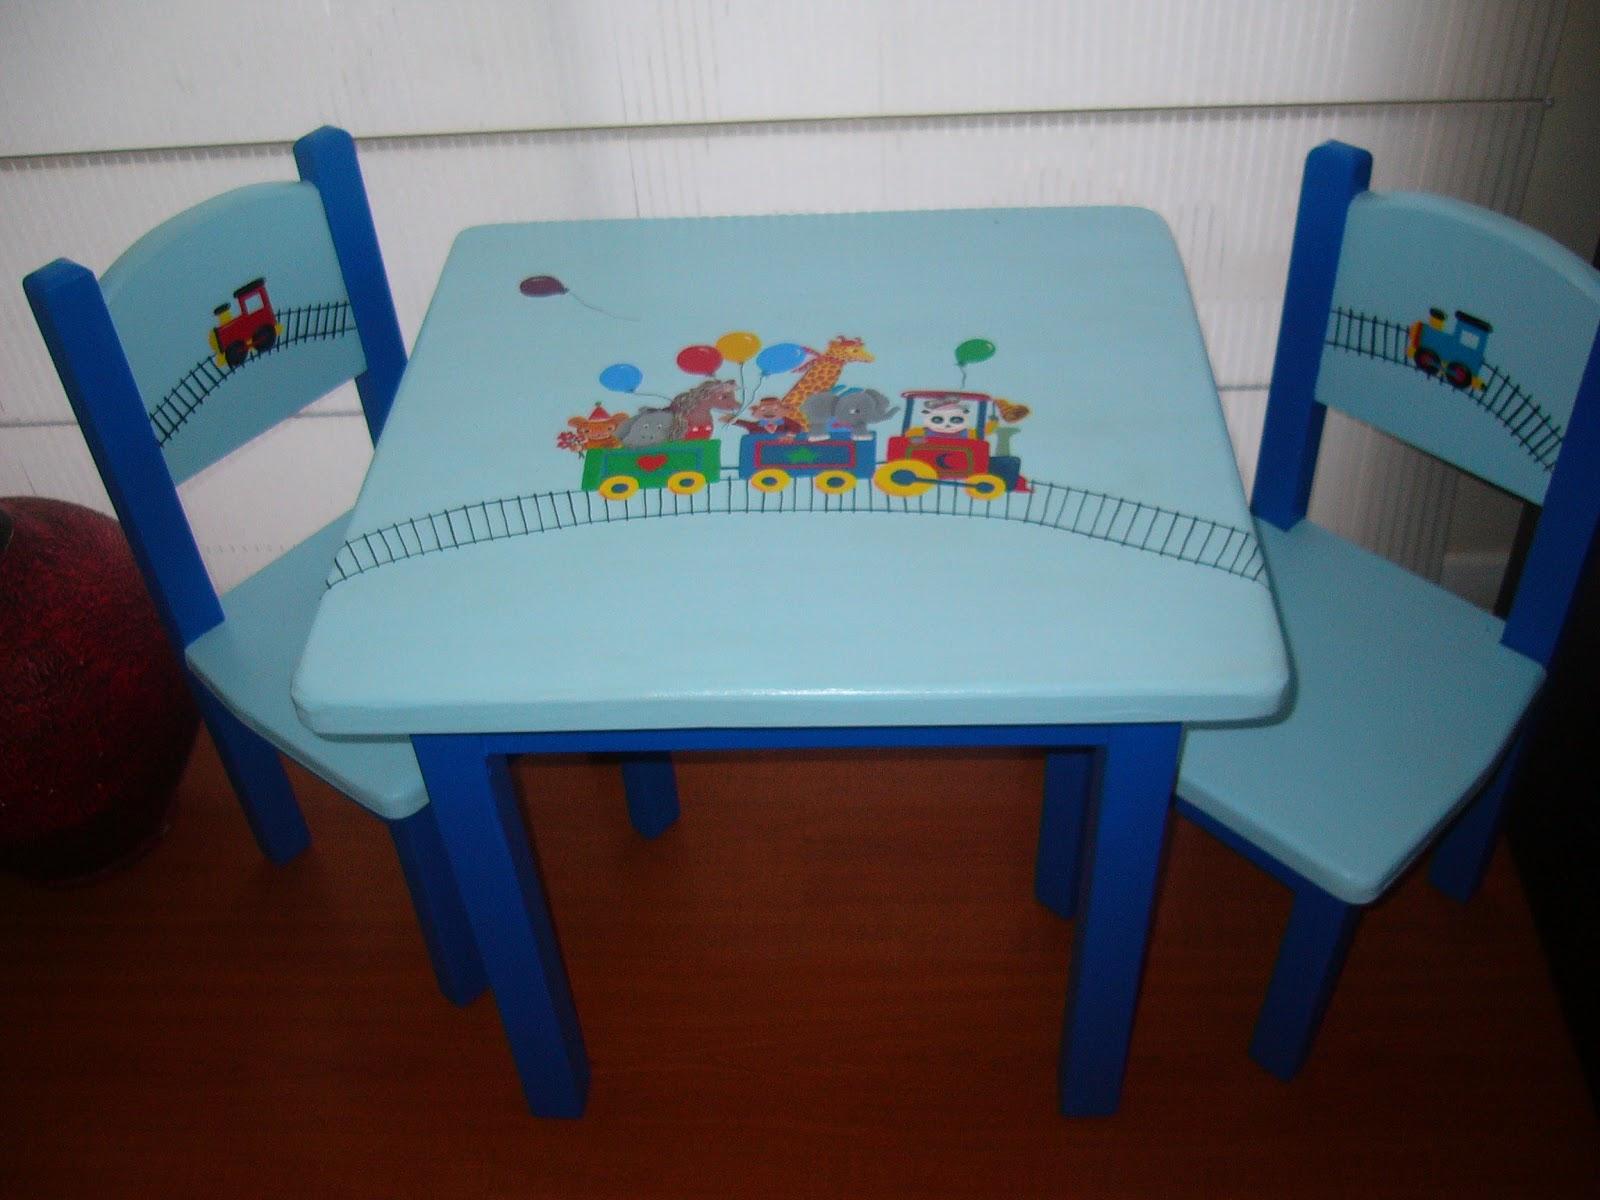 Muebles infantiles decoraci n para ni os juguetes - Mesas pequenas para ninos ...